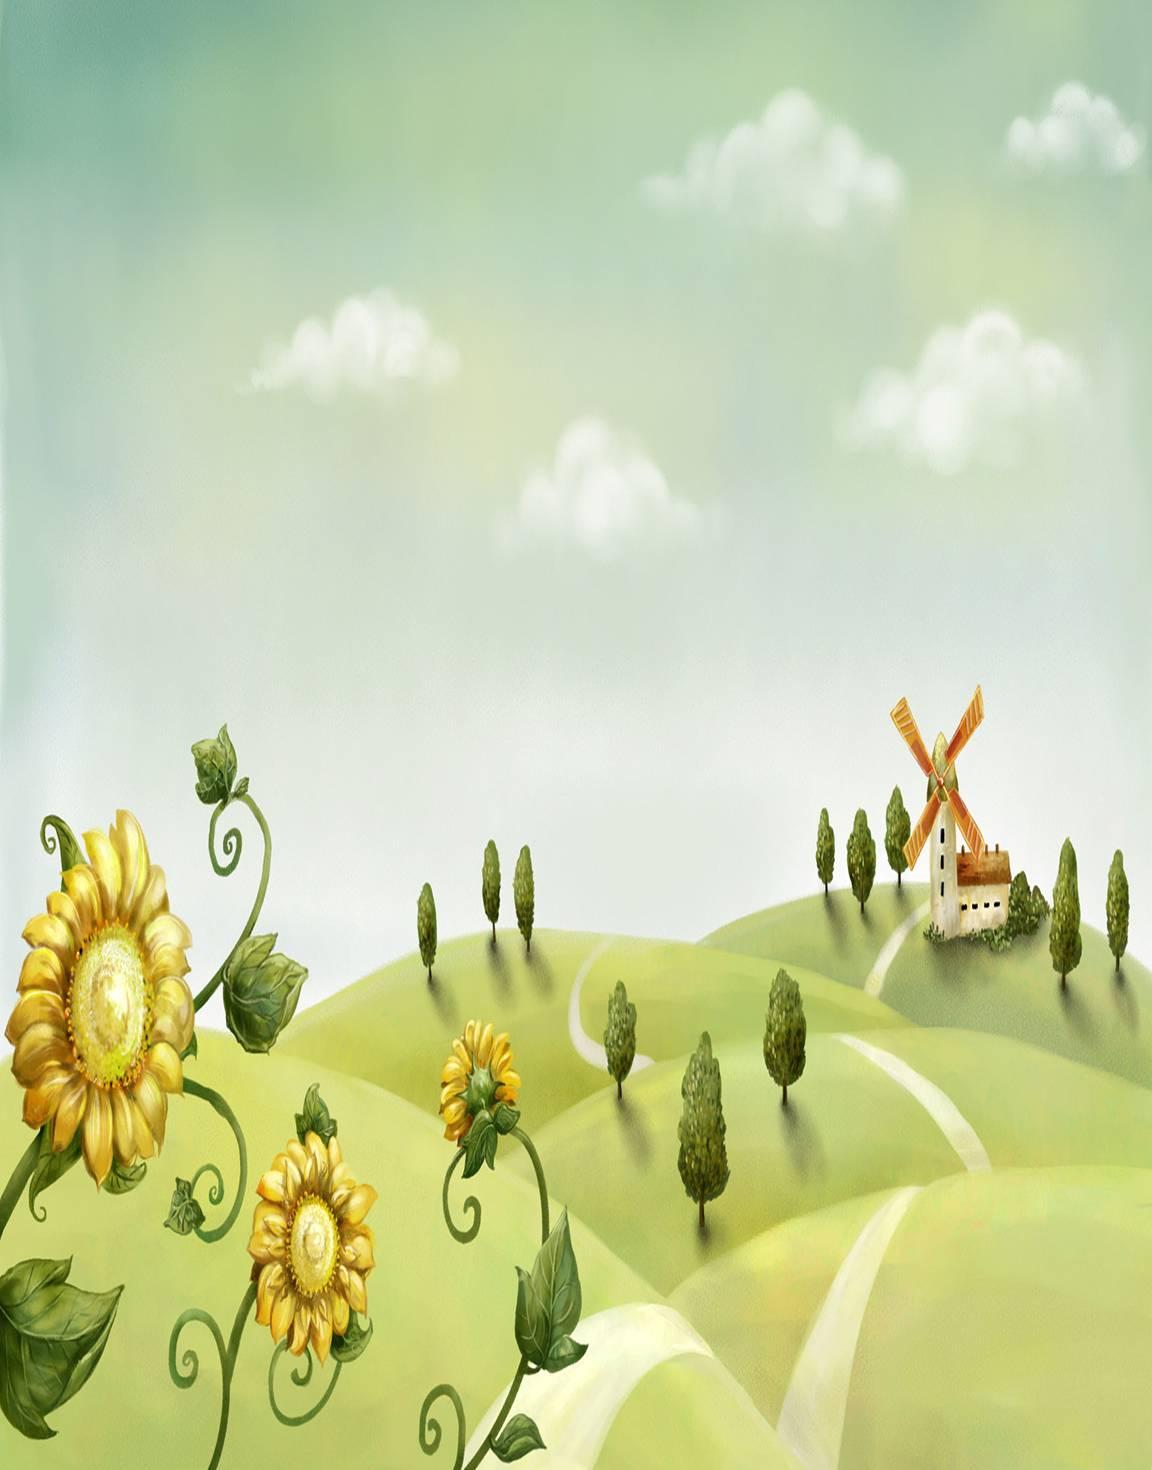 Аист картинки анимашки, поздравления